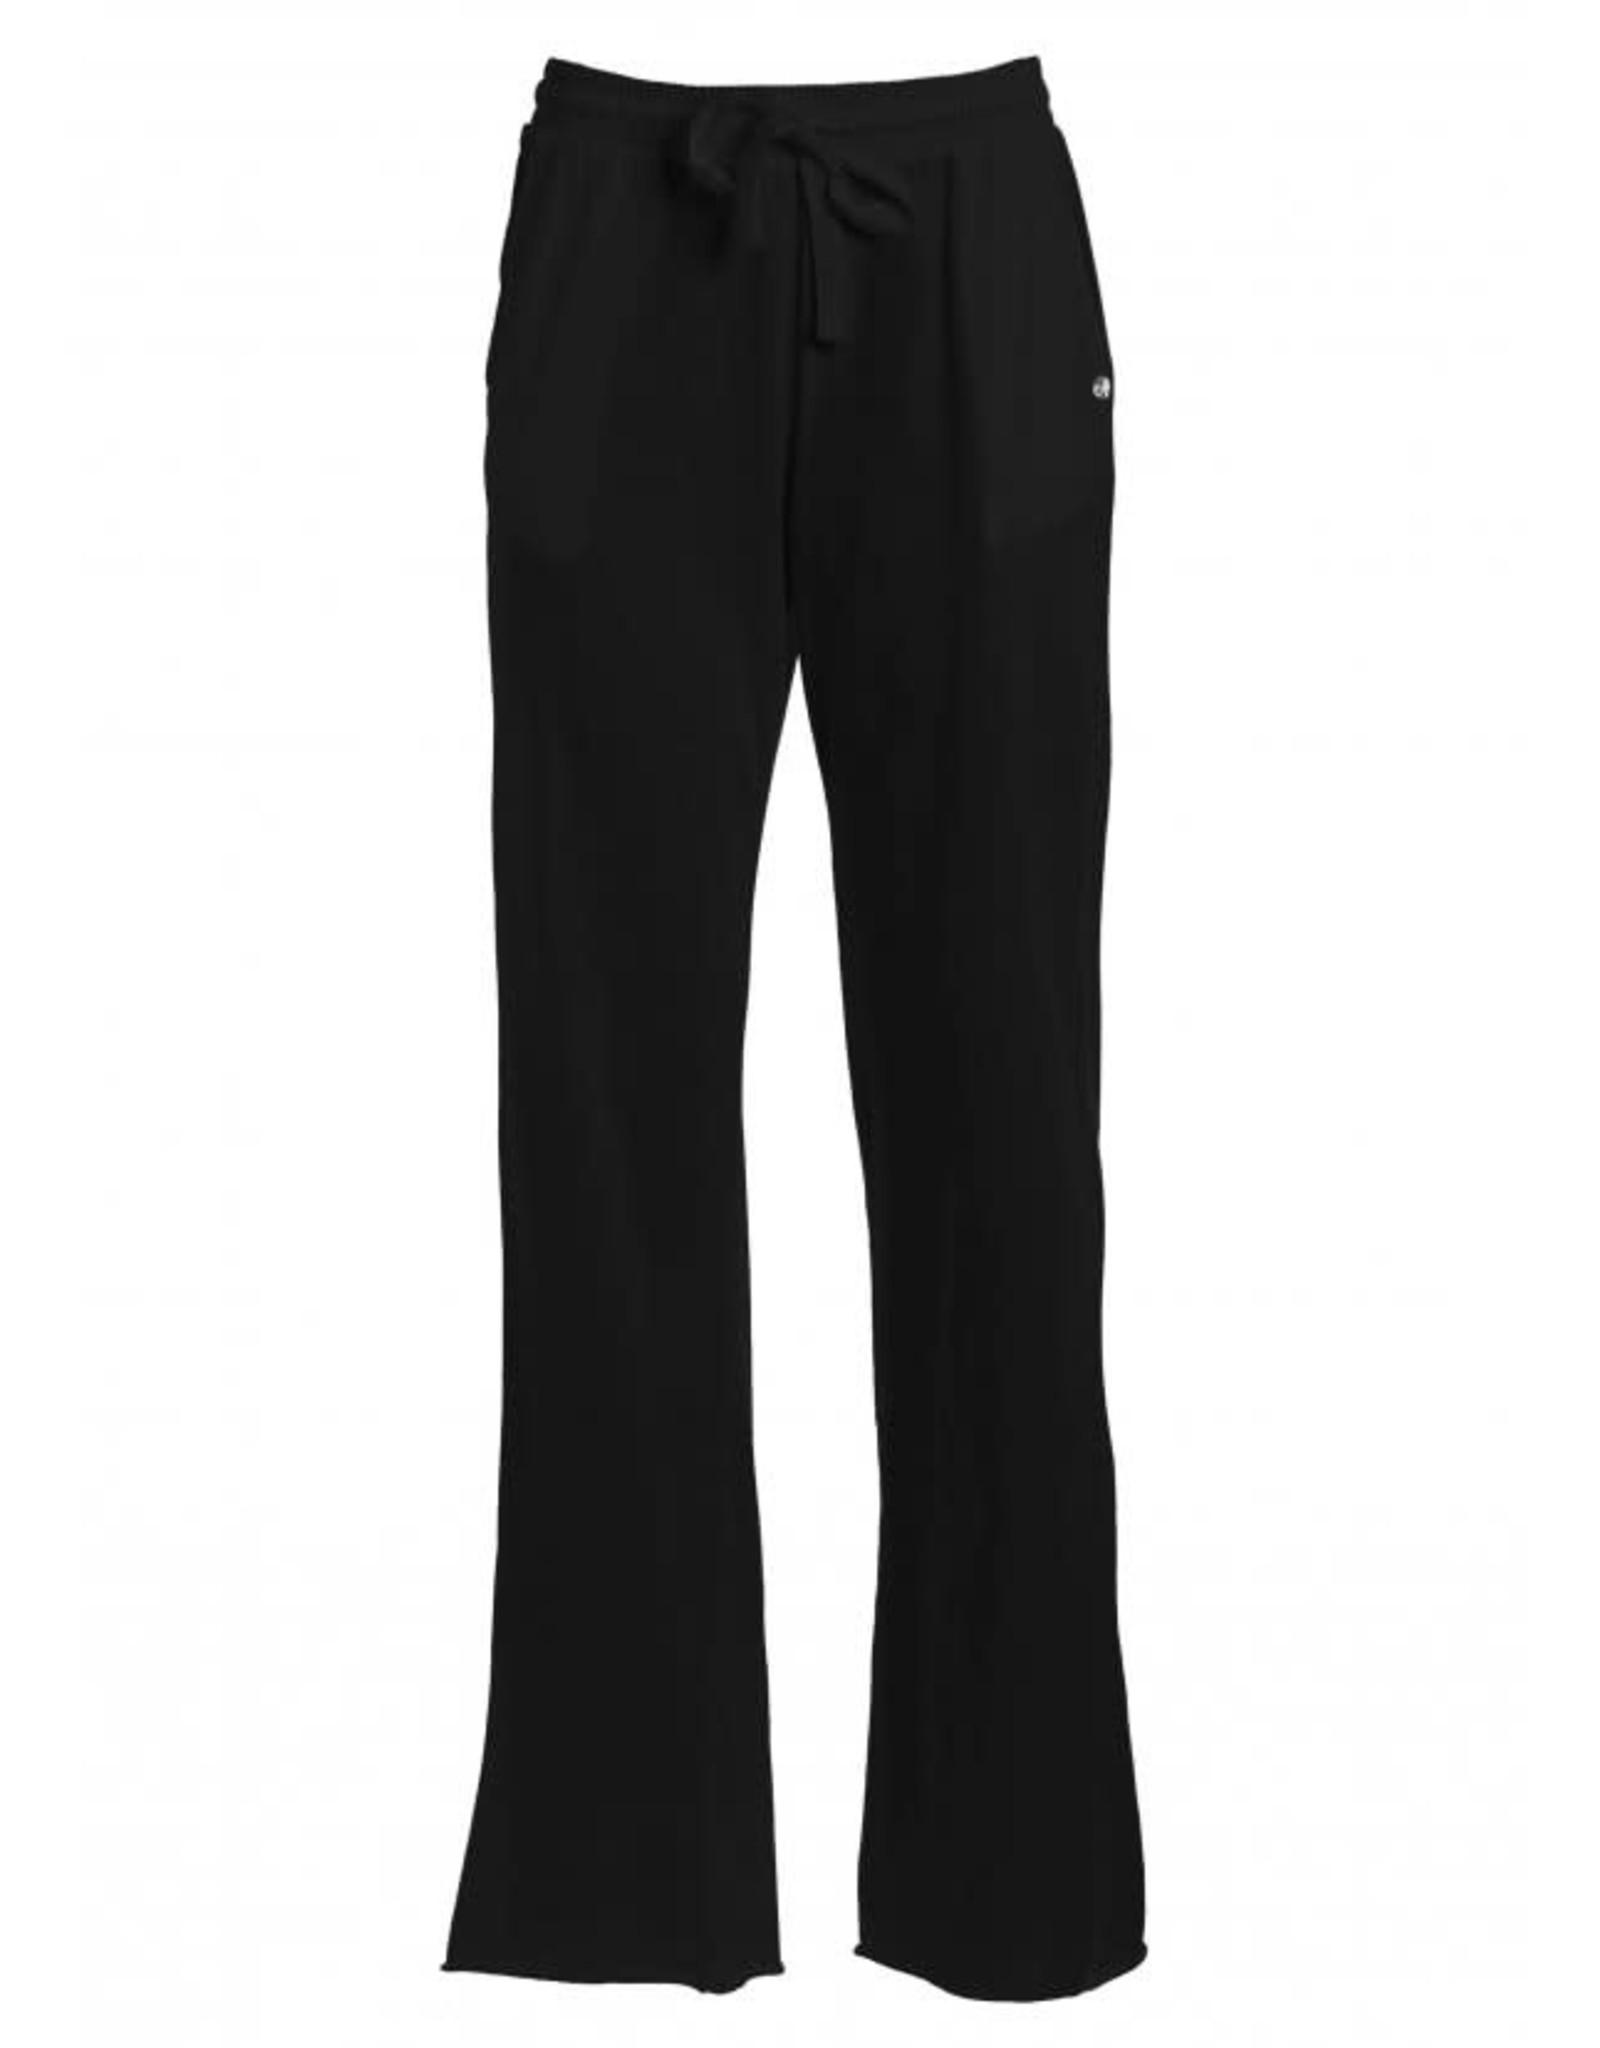 Deha SS21 B24726 Jersey pants